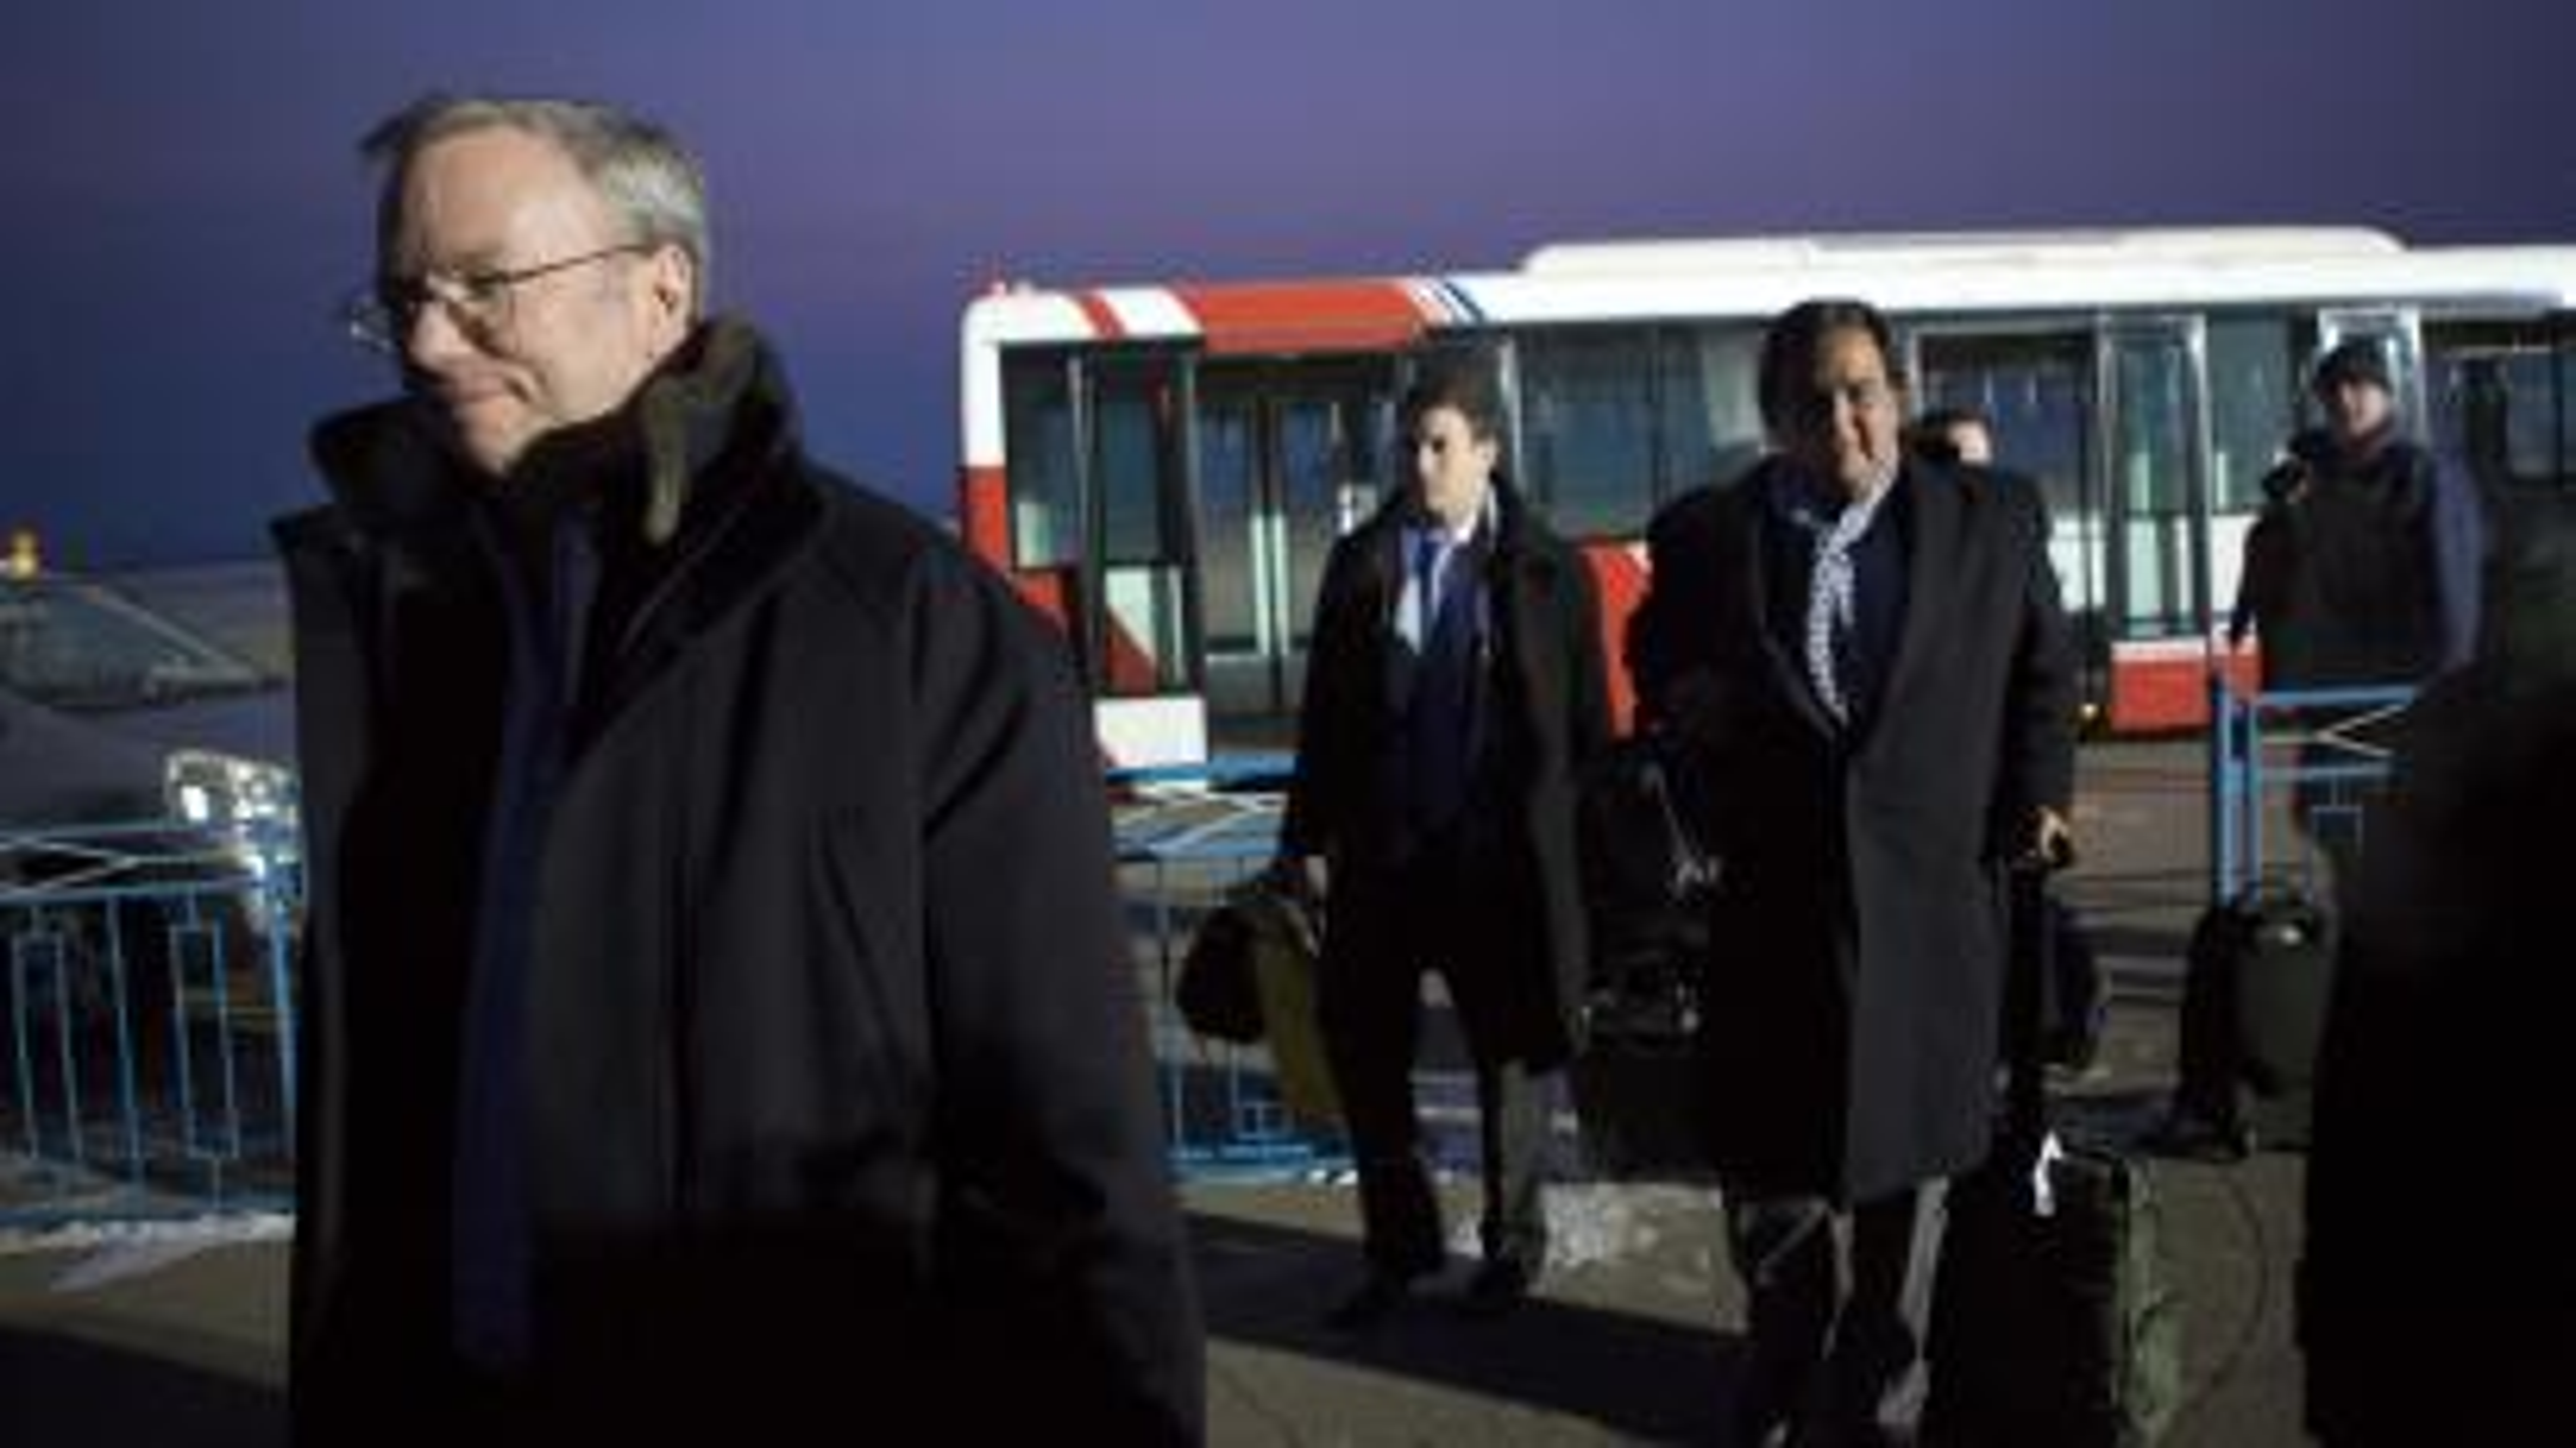 Schmidt and Richardson arrive at Pyongyang International Airport